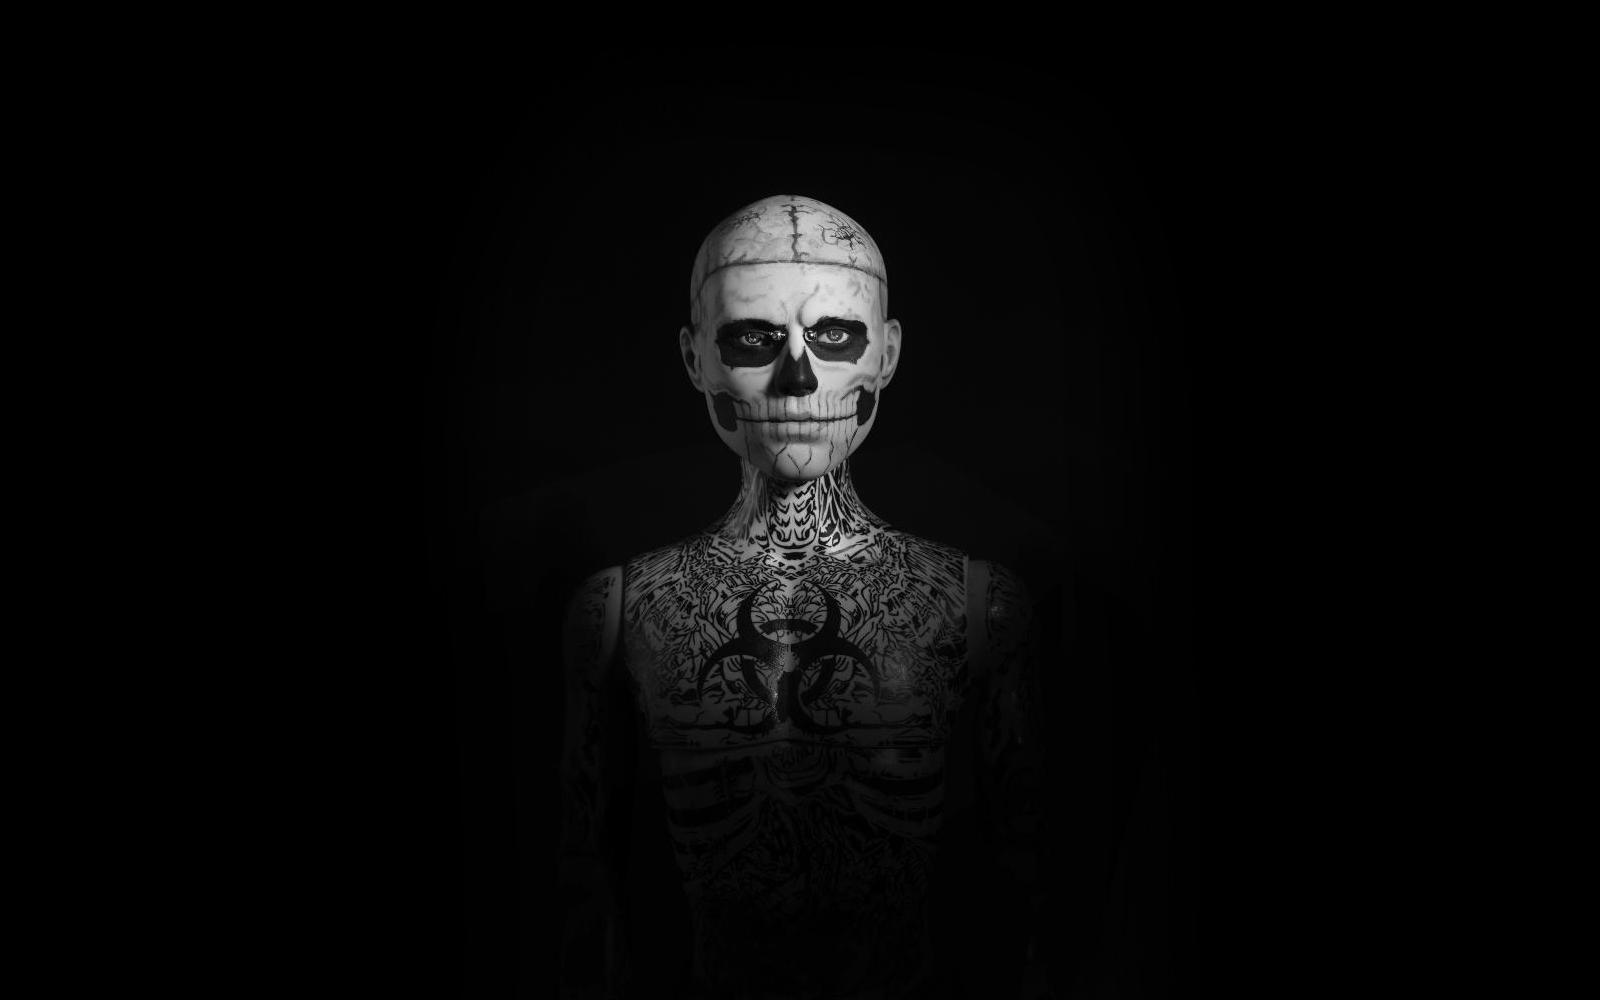 Free Download Description Zombie Boy Hd Wallpaper Is A Hi